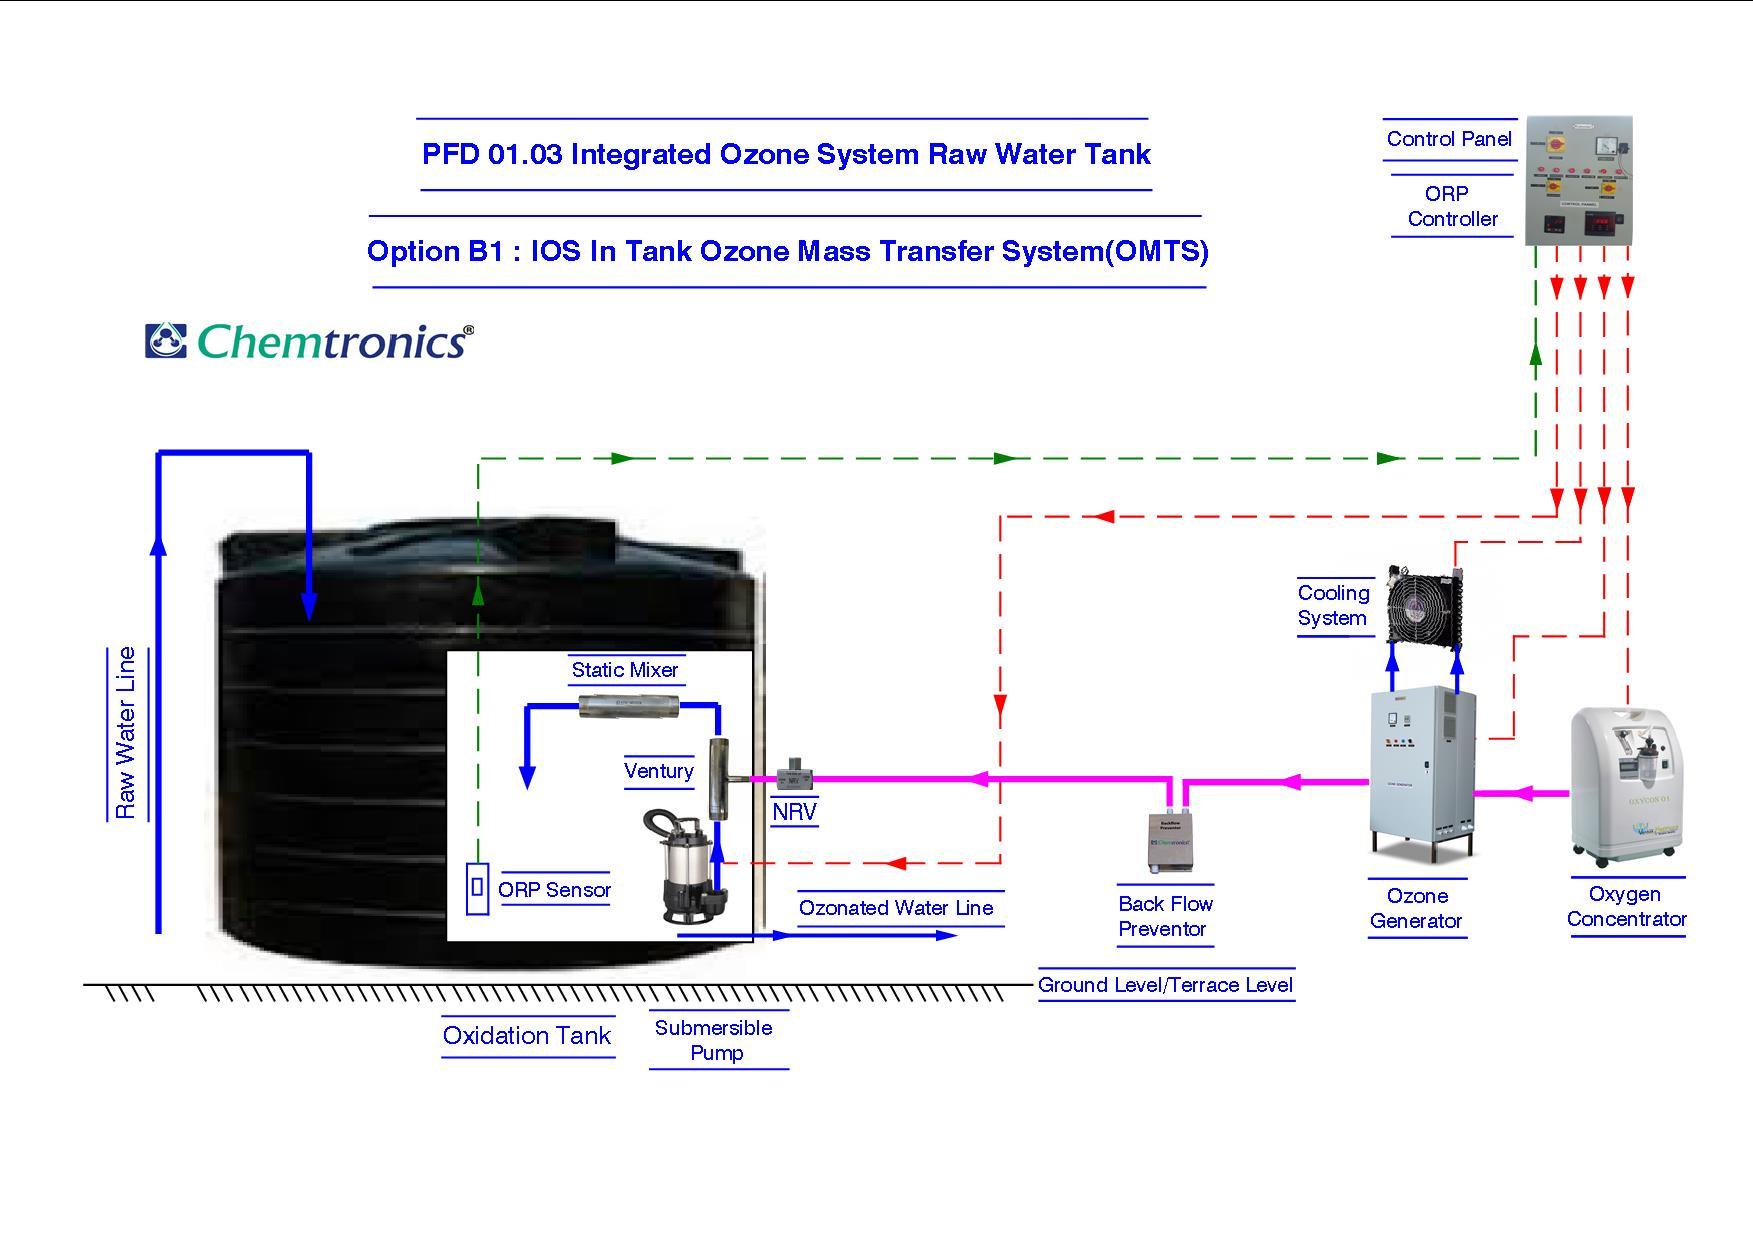 Ozonation Process Flow Diagrams Diagram Pfd Mumbai 01 Raw Water Drinking Utility 0101 Option 0102 External Ozone Mass Transfer System For